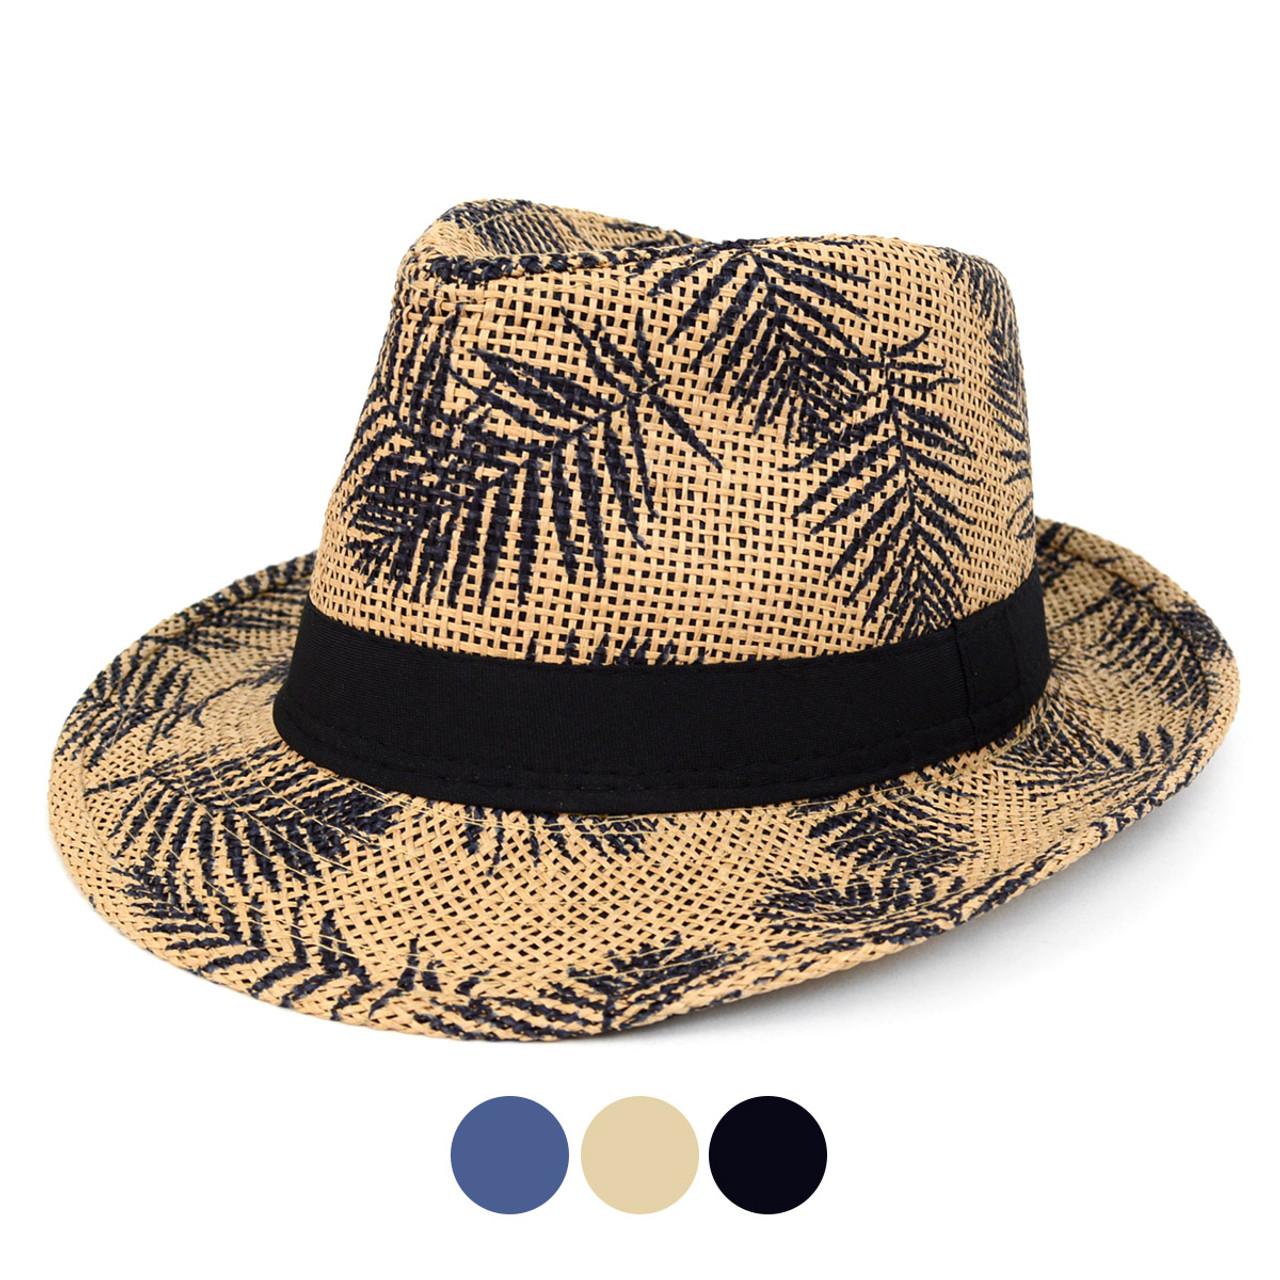 Tropical Palm Leaves Kid s Wide Brim Fedora Hat - BF180602 2d11c131bb1